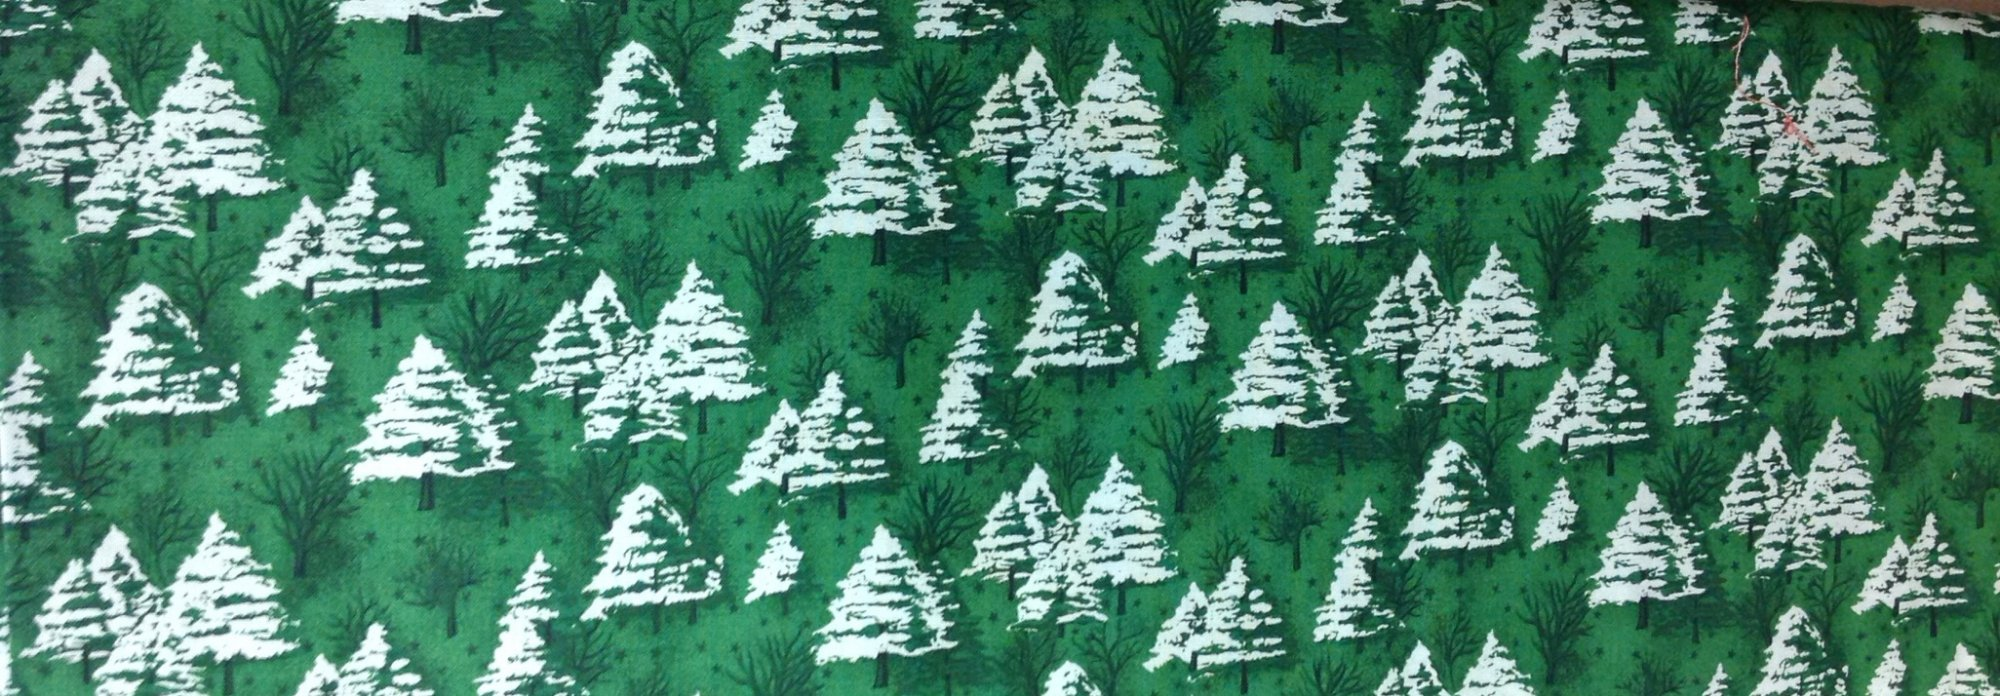 Seasons Greetings-Green